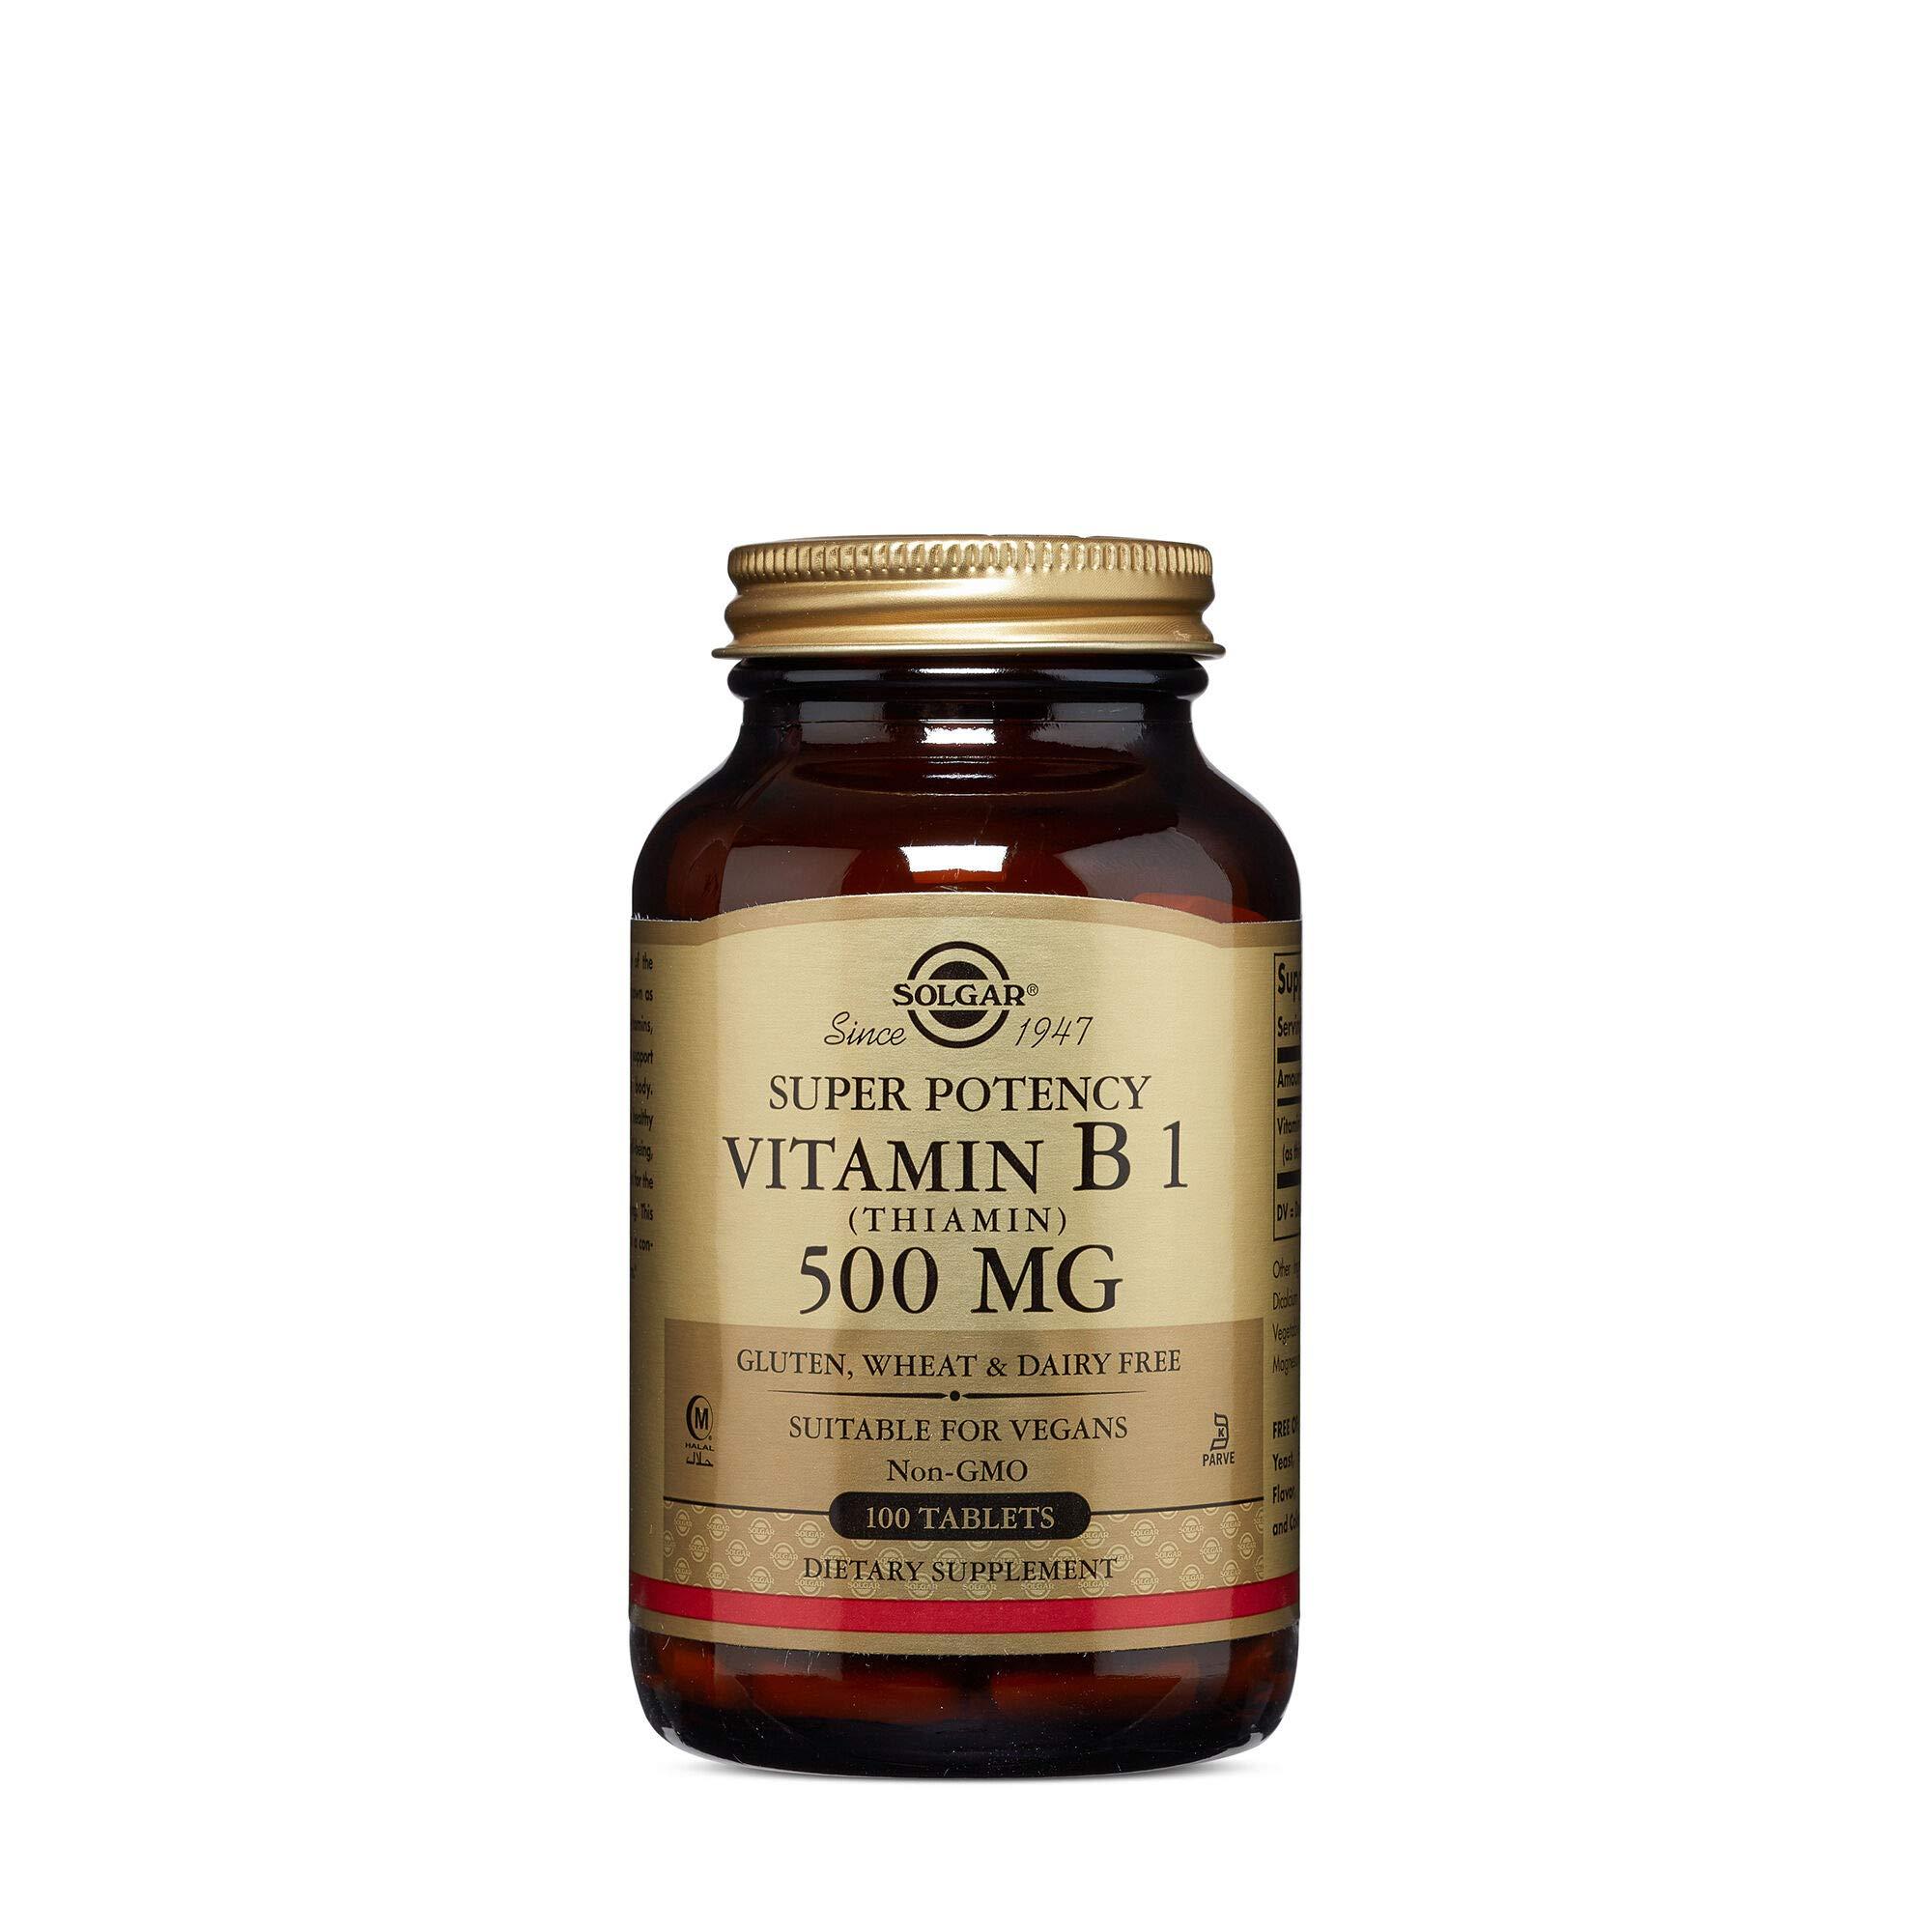 Solgar Super Potency Vitamin B1 Thiamin 500 MG by Solgar